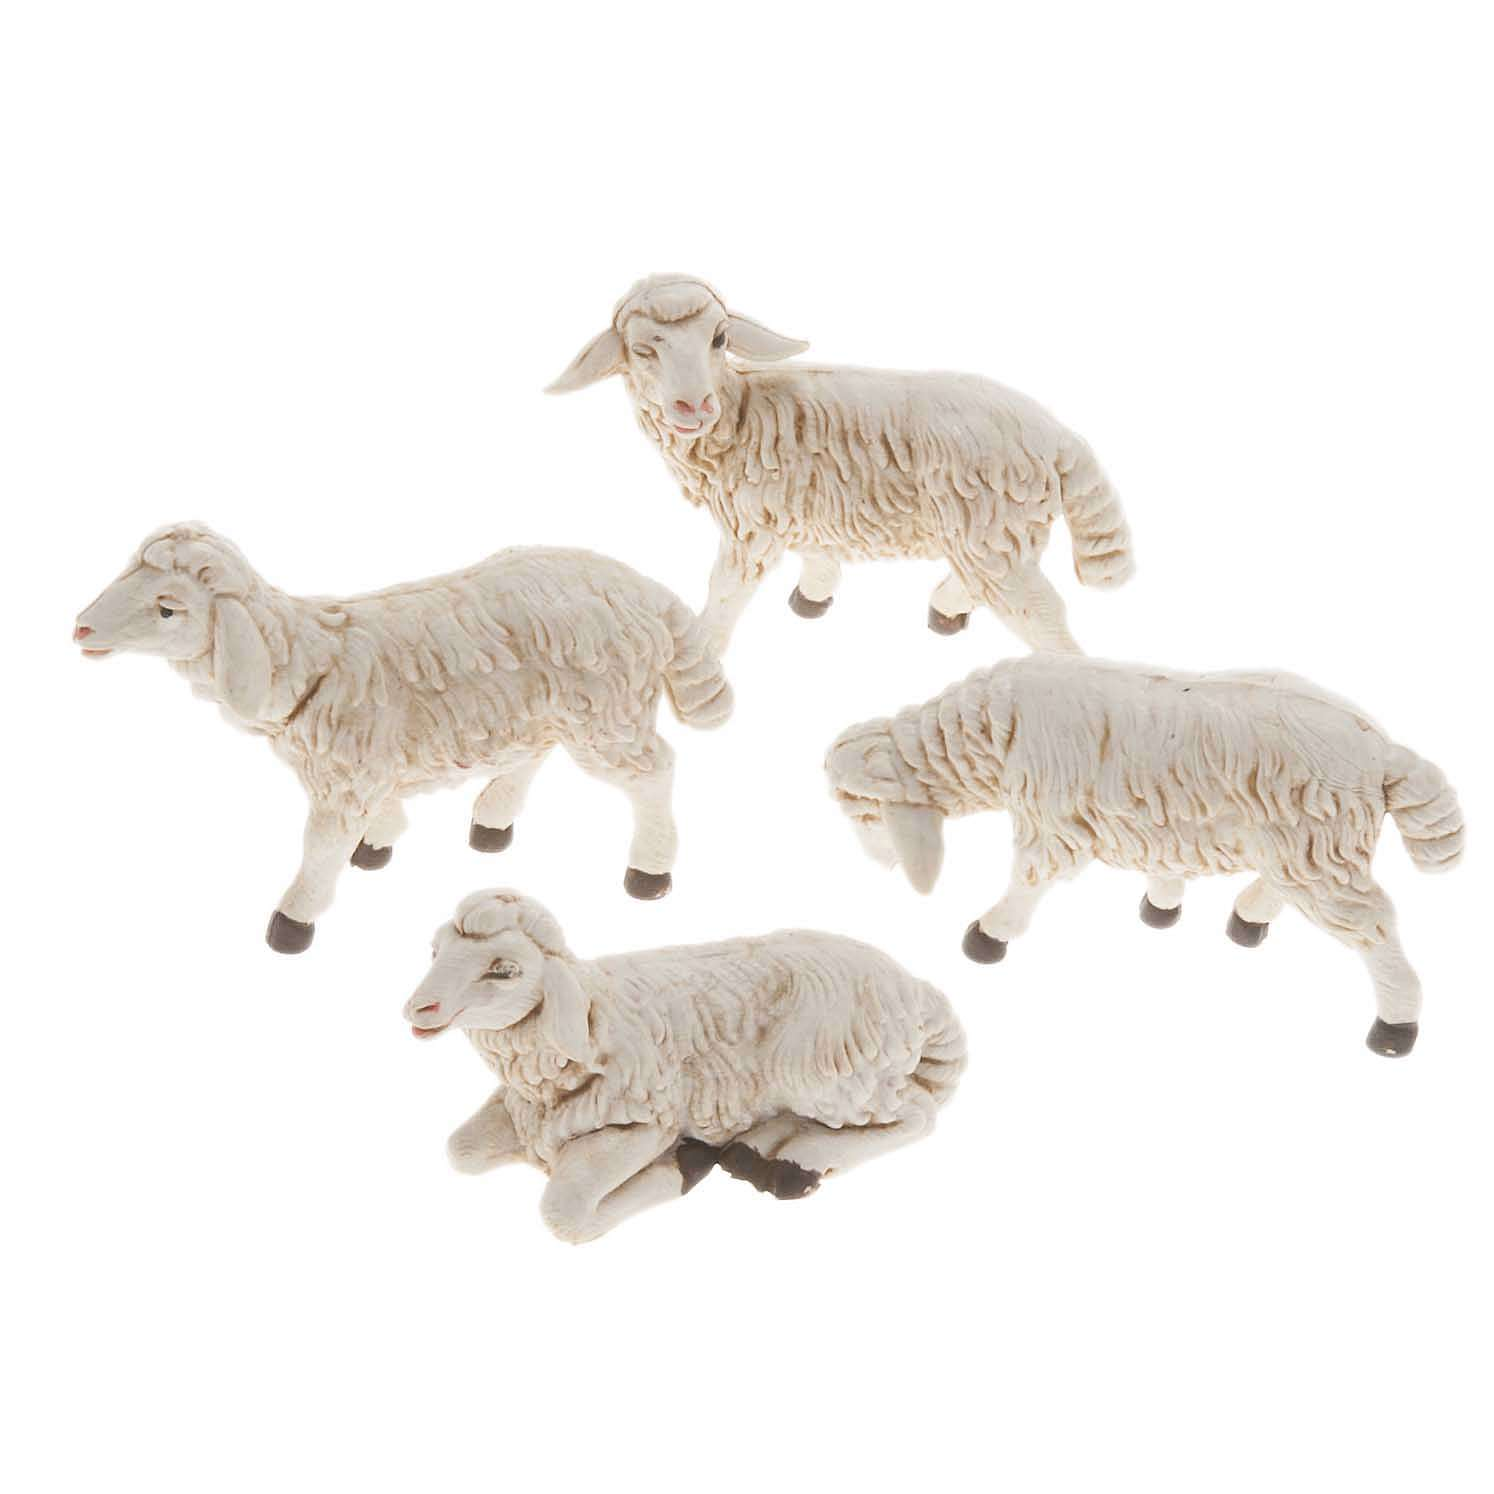 Nativity scene figurines, plastic sheep, 4 pieces 12cm 3